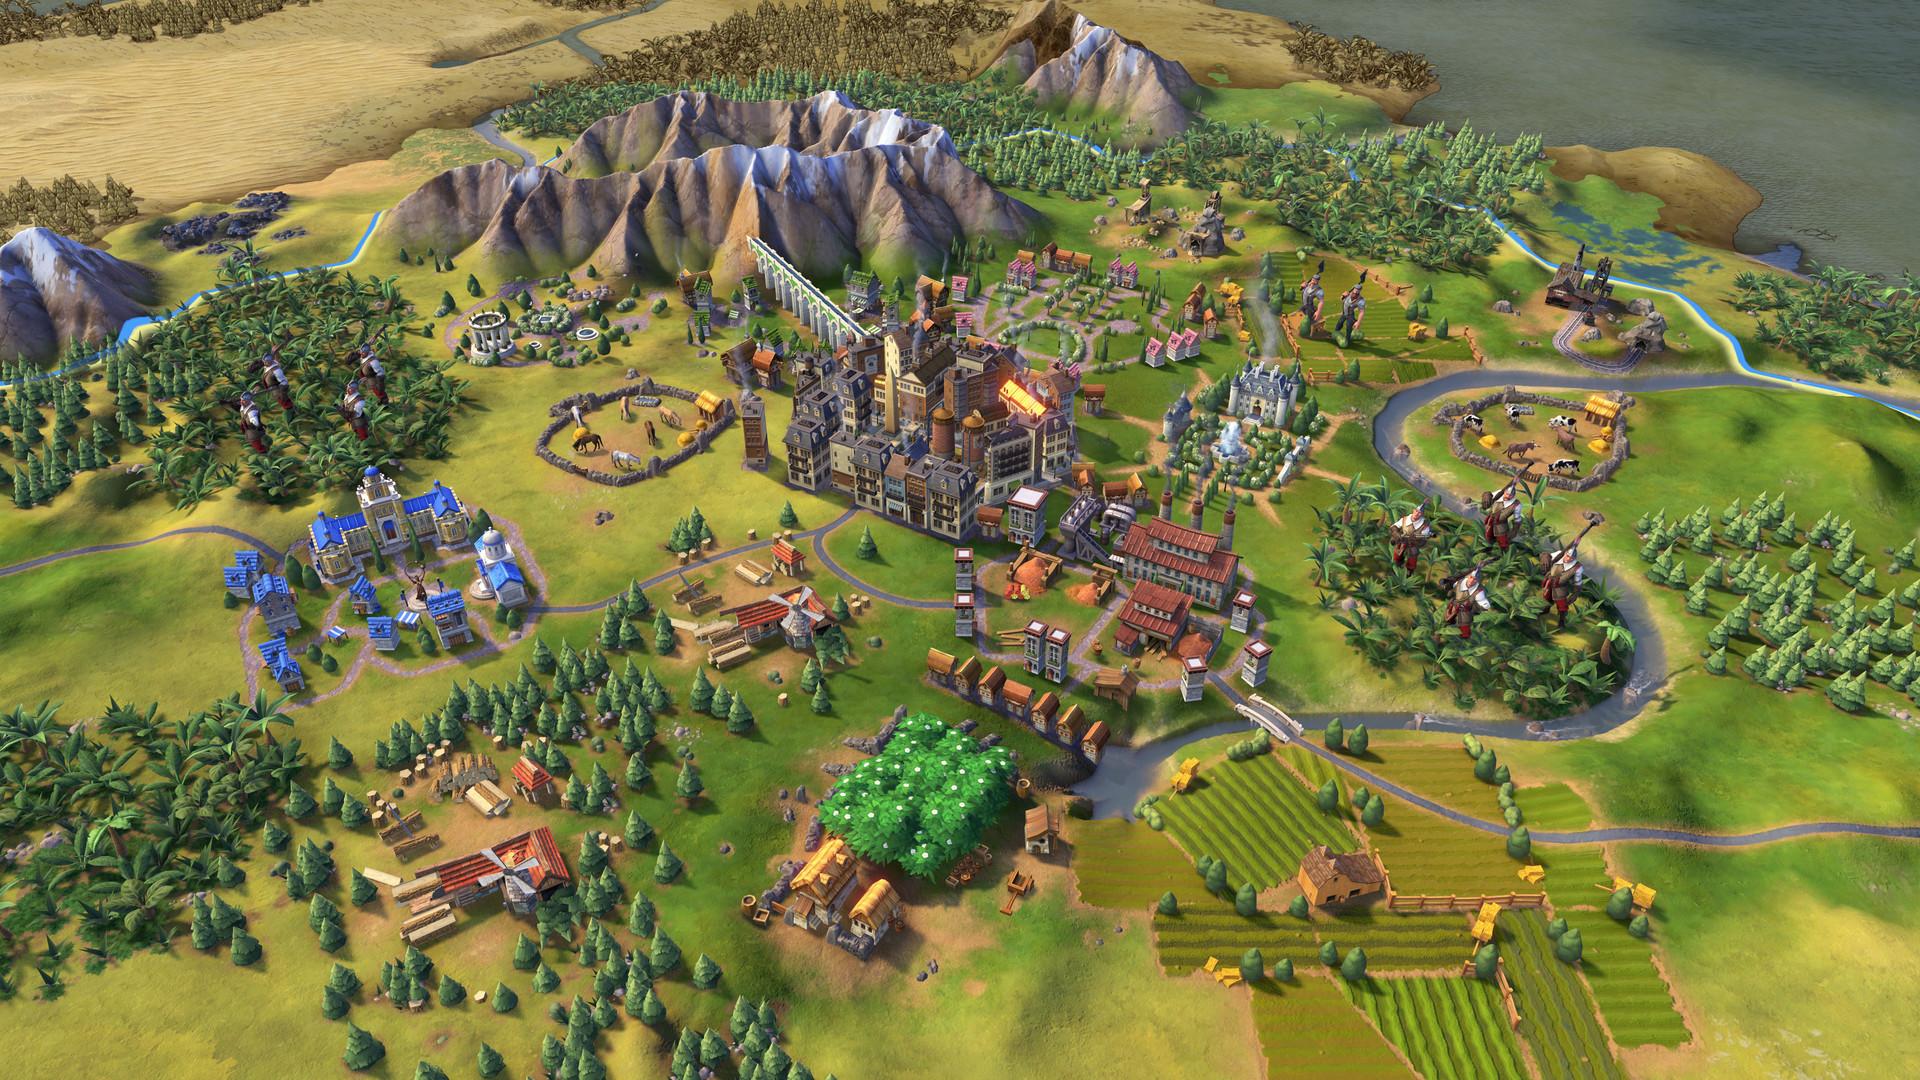 Civilization VI is having a free weekend on Steam | PCGamesN